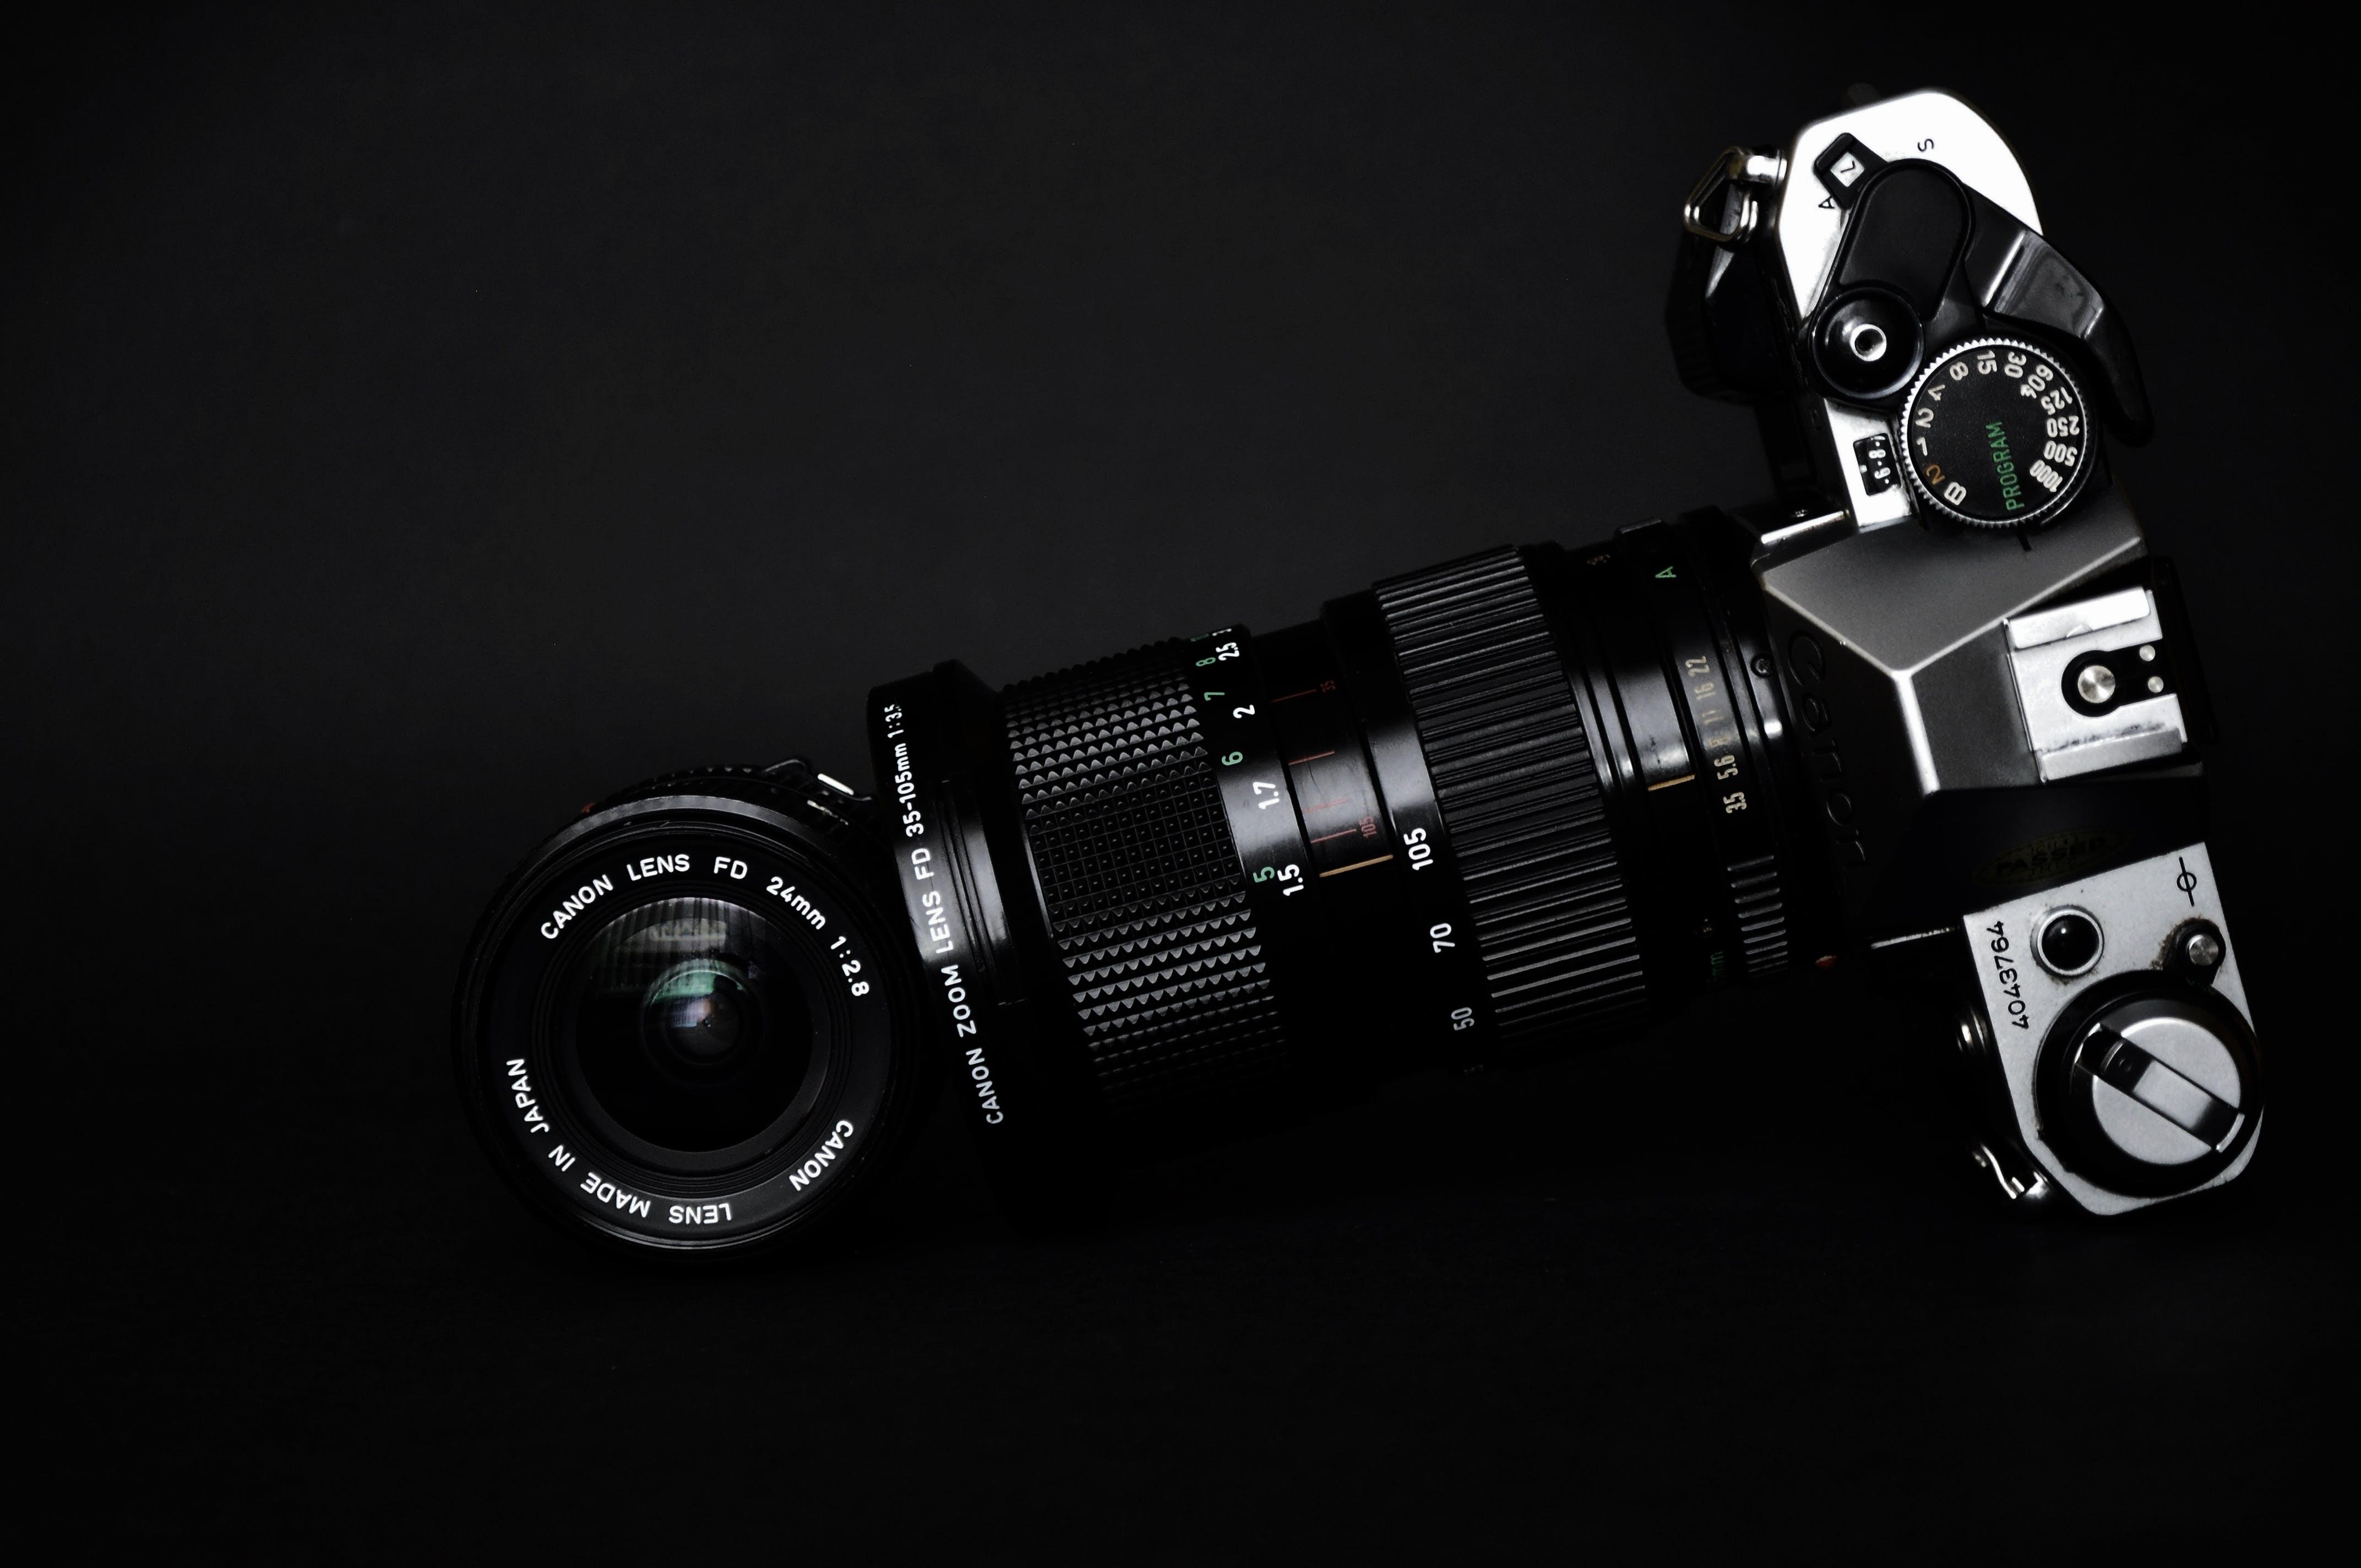 Black and Gray Slr Camera